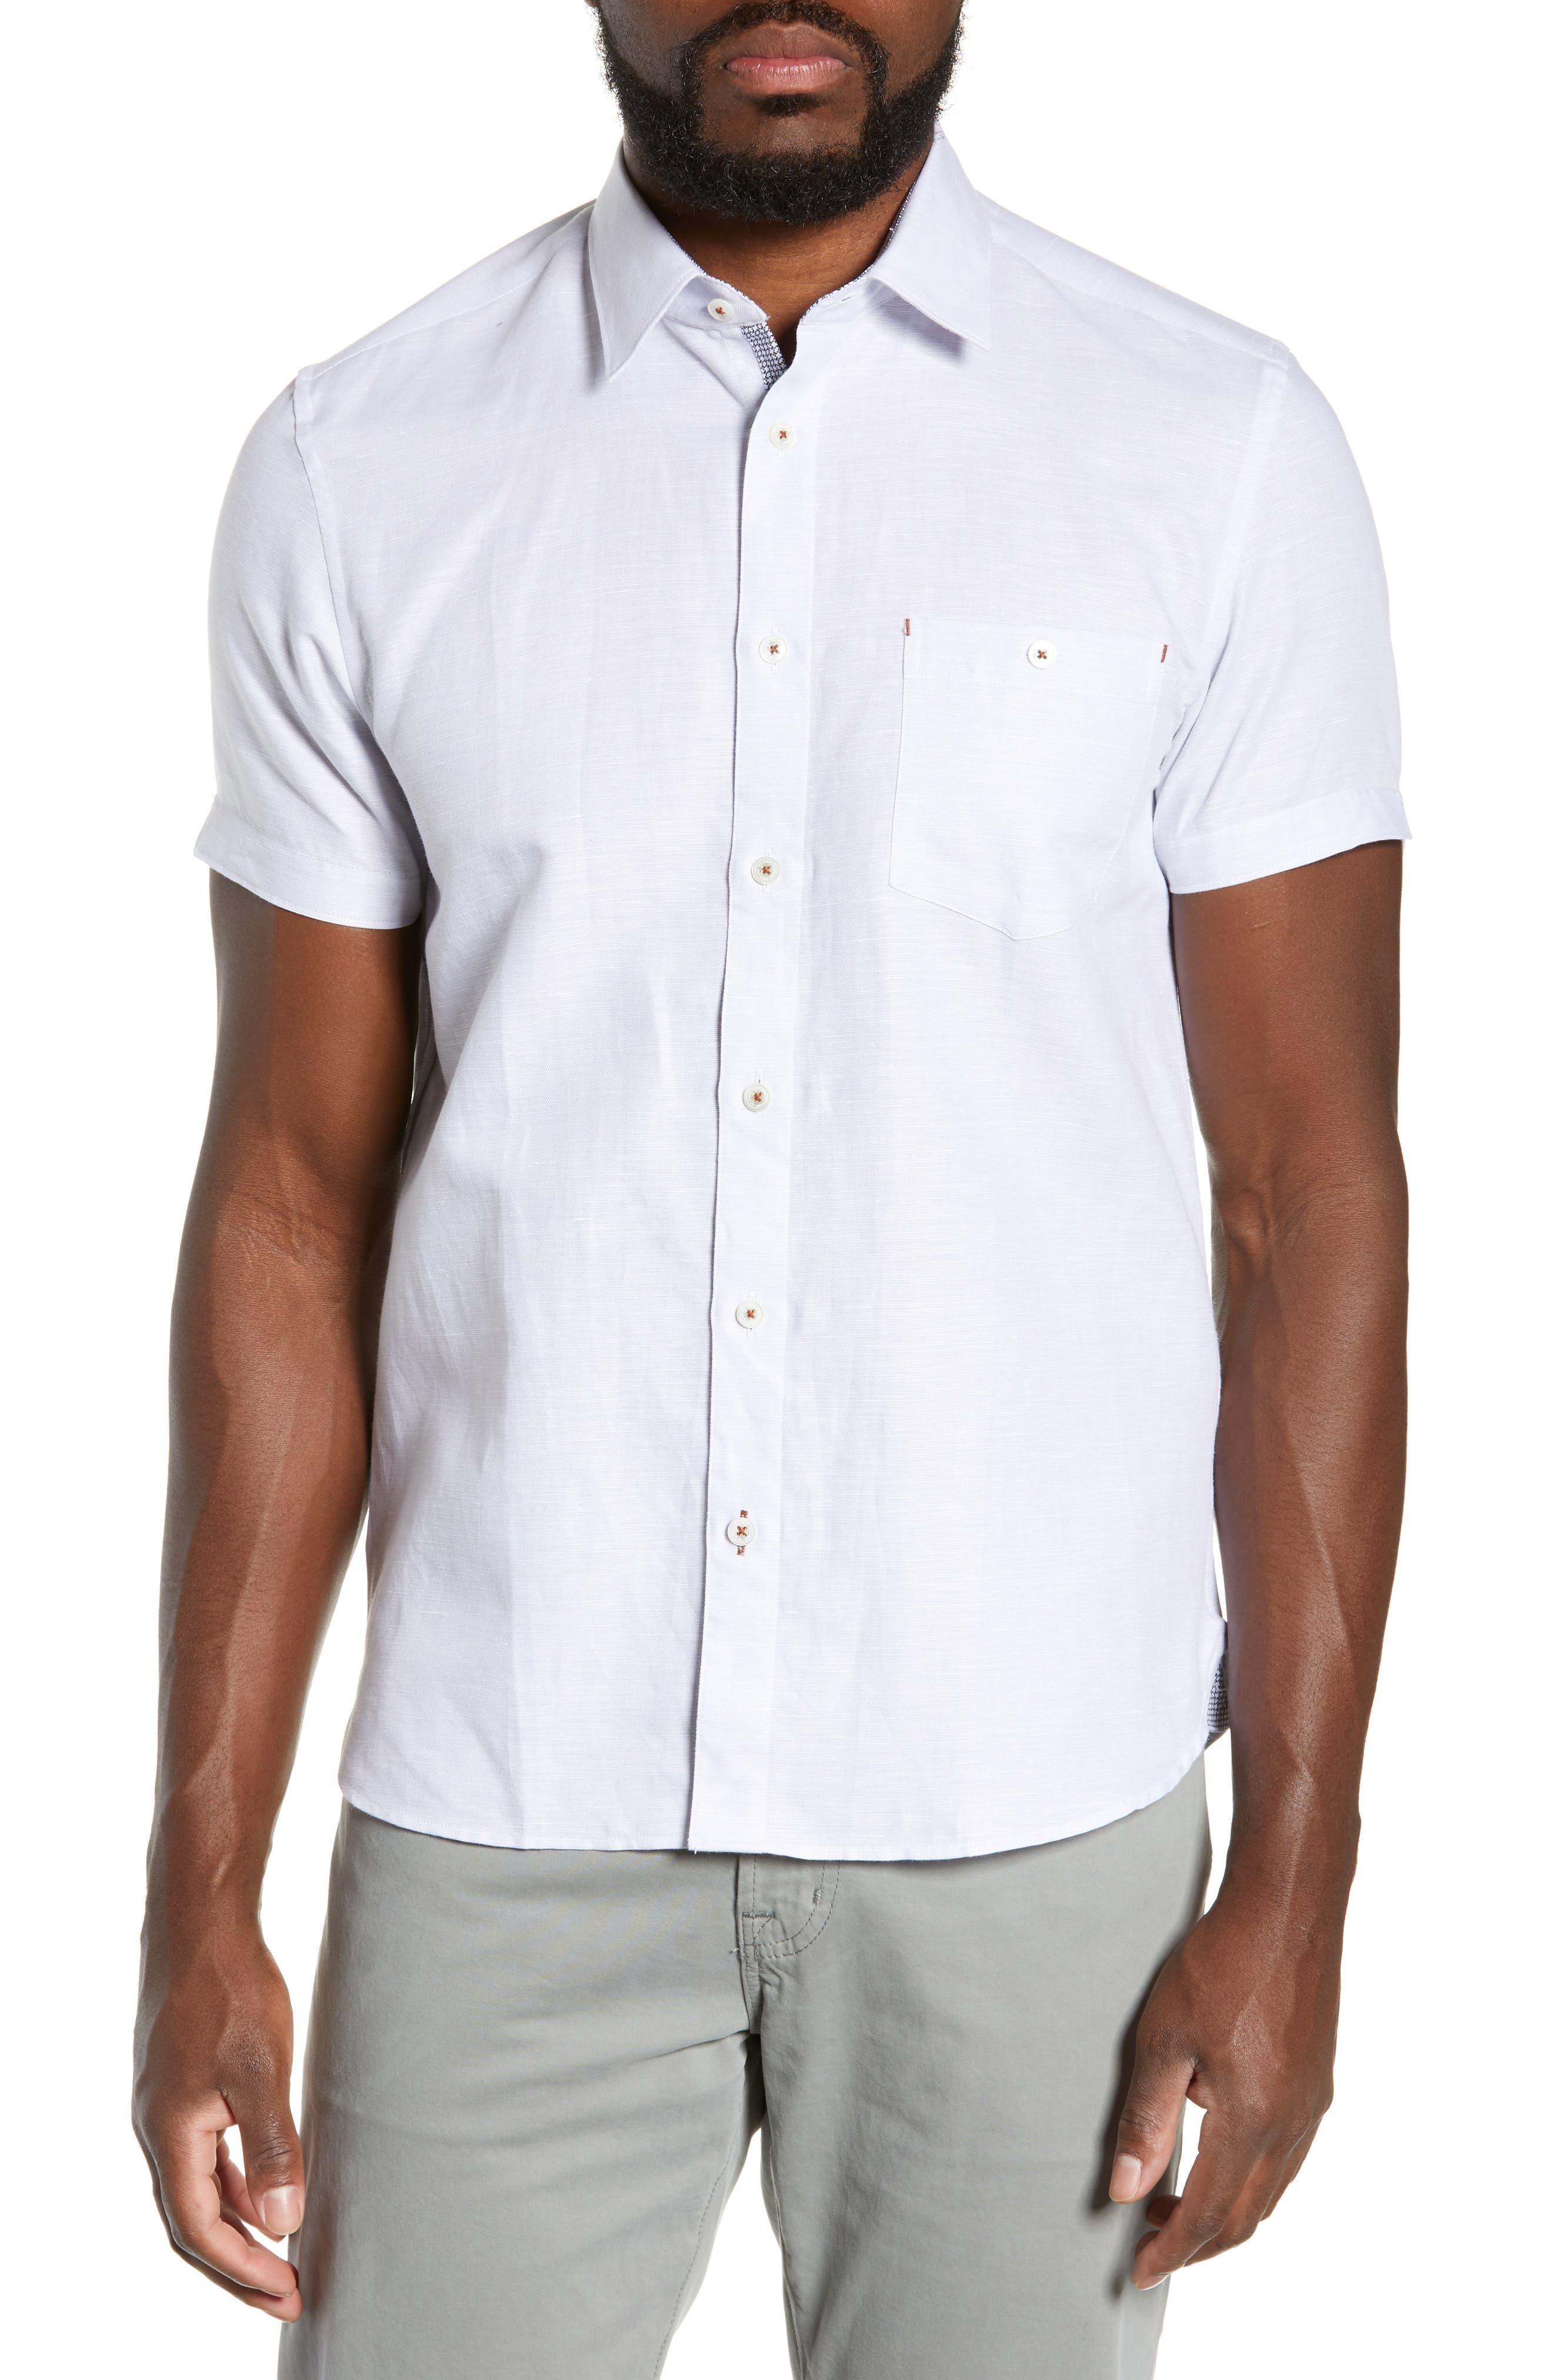 TED BAKER LONDON, Graphit Slim Fit Cotton & Linen Sport Shirt, Main thumbnail 1, color, GREY